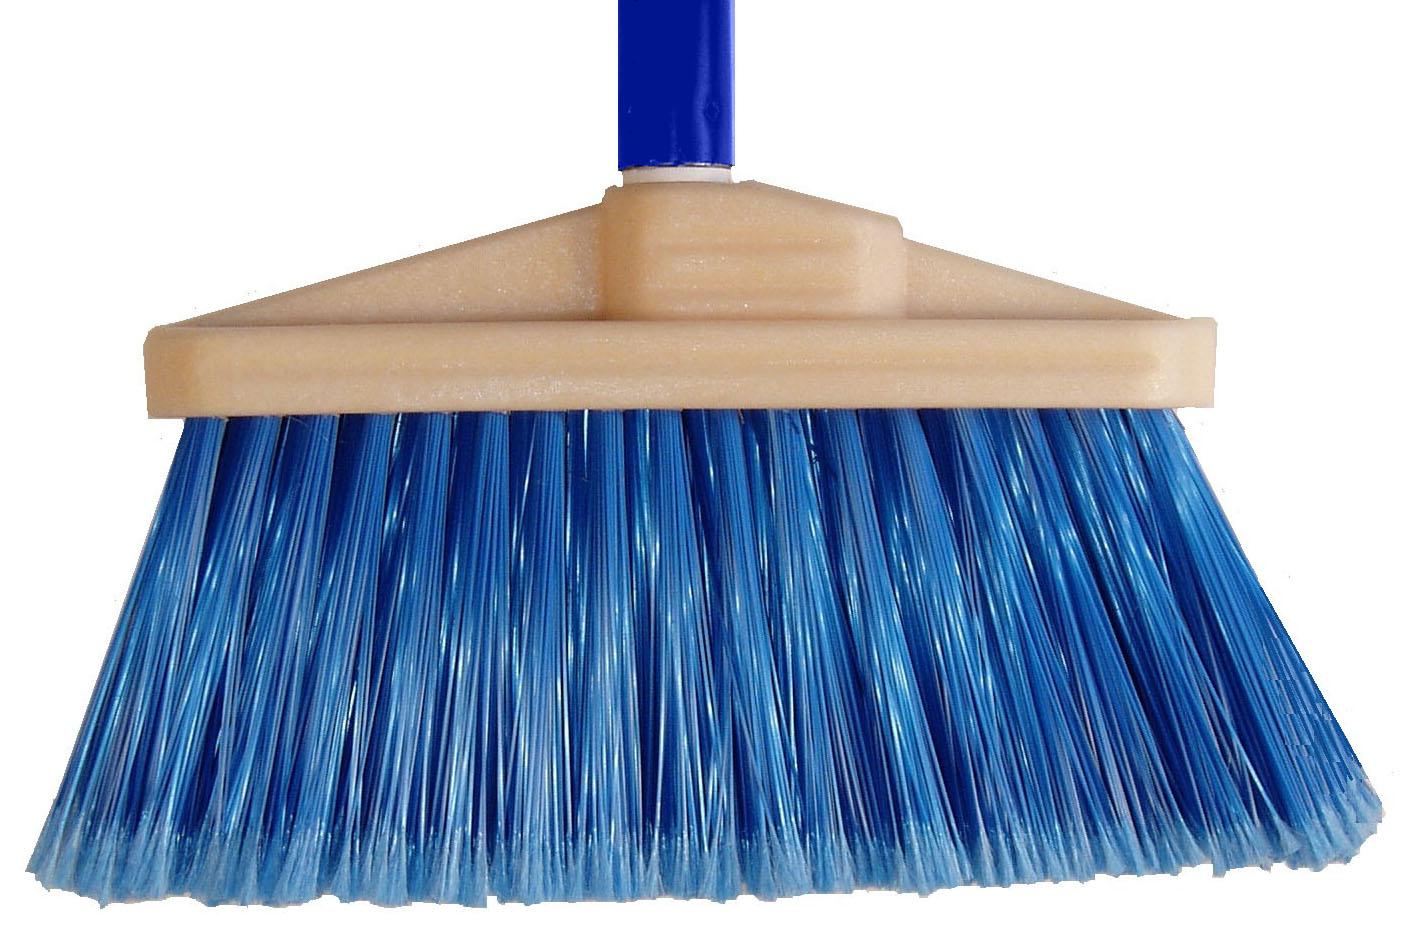 Better Brush ProductsLight Sweep Upright Broom - 4\